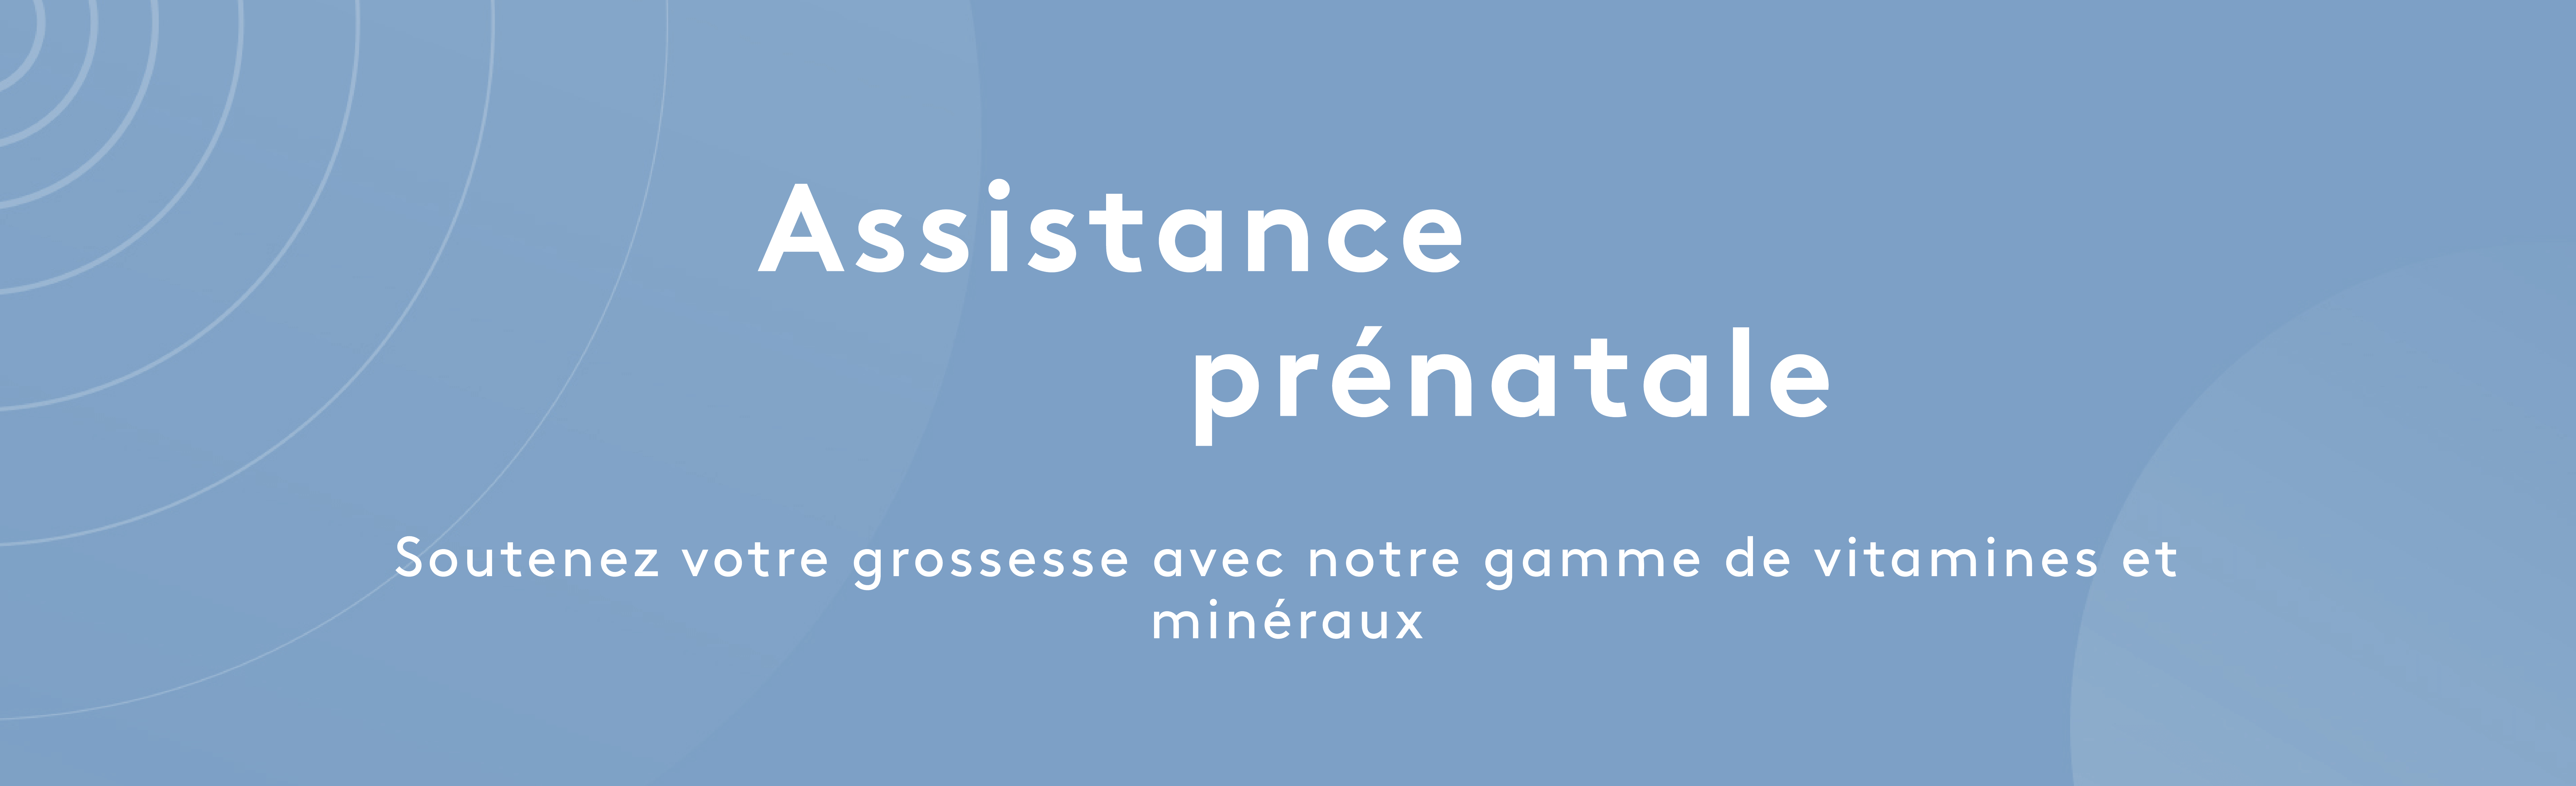 Assistance Prenatale| Myvitamins